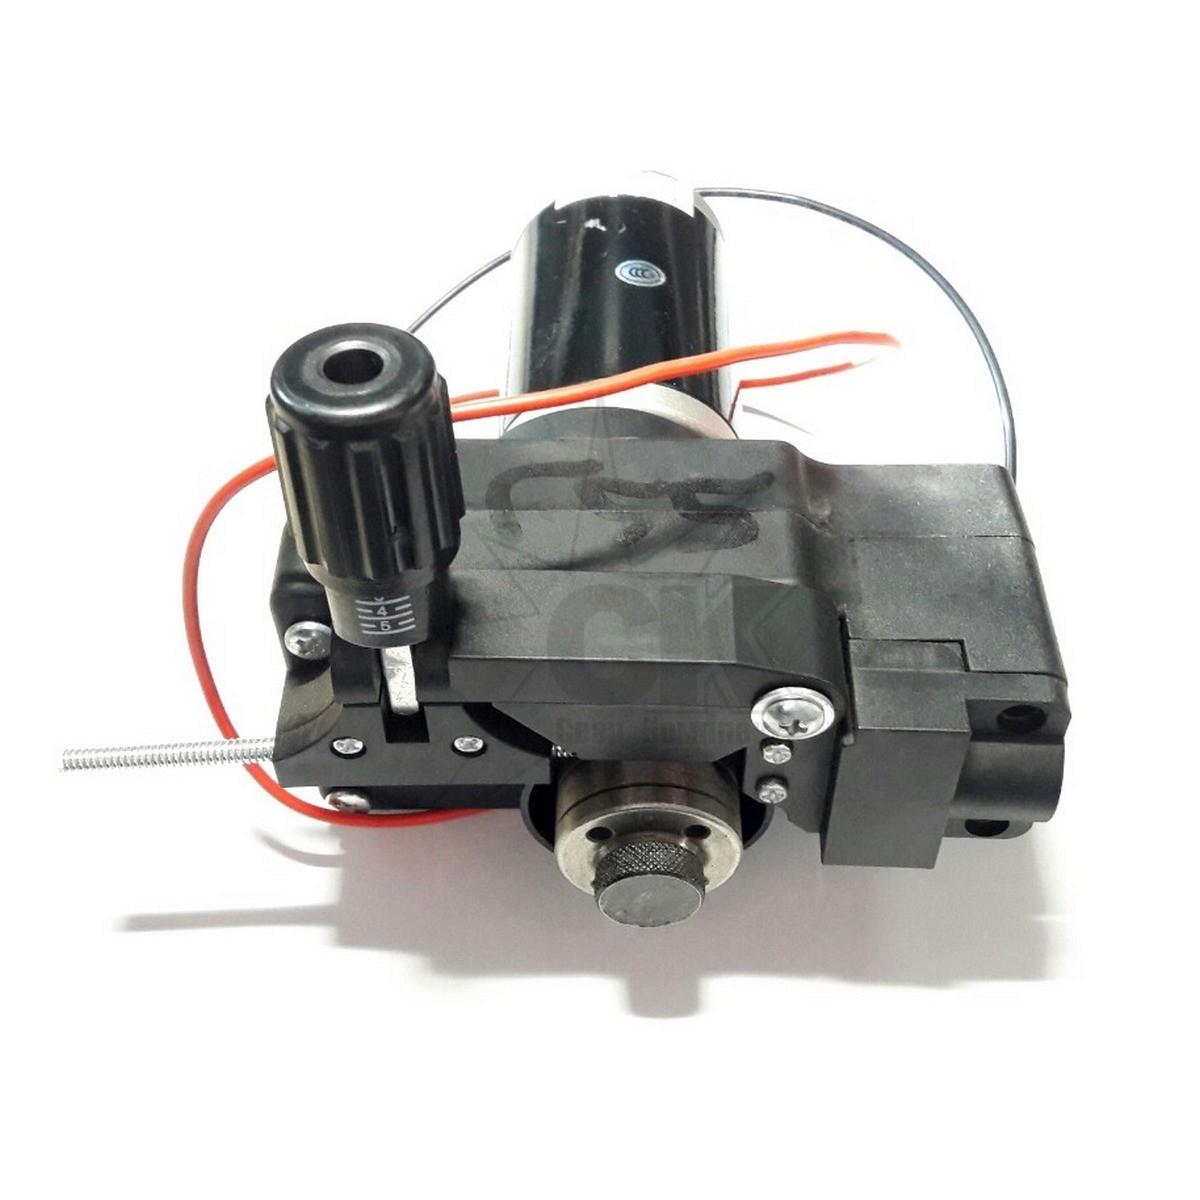 Механизм подачи проволоки пластик SF-14030